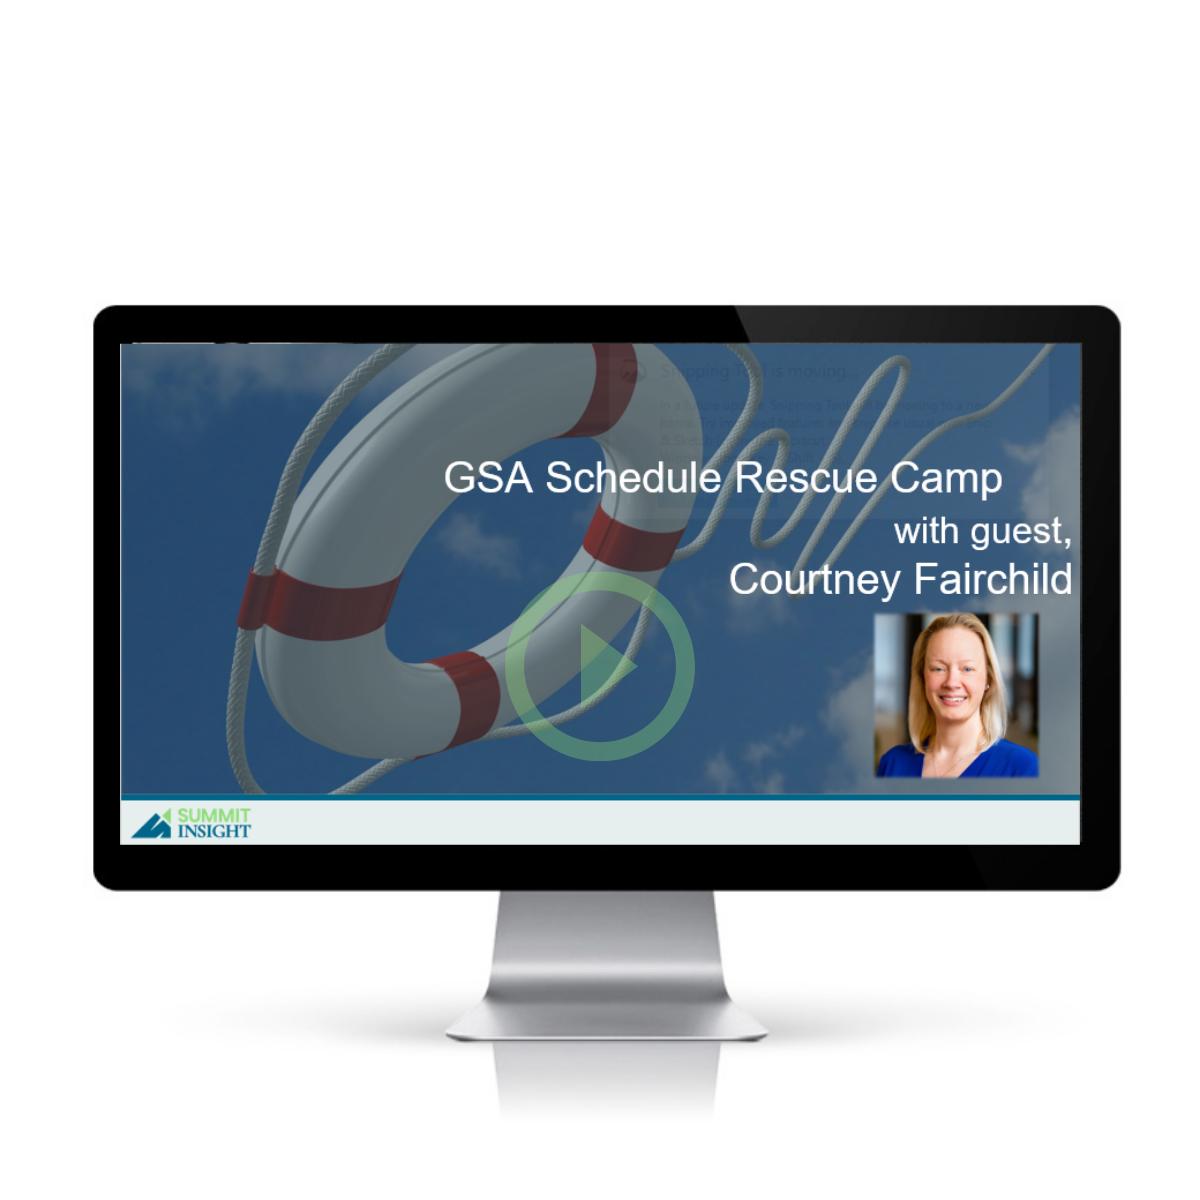 GSA Schedule Rescue Camp: Courtney Fairchild